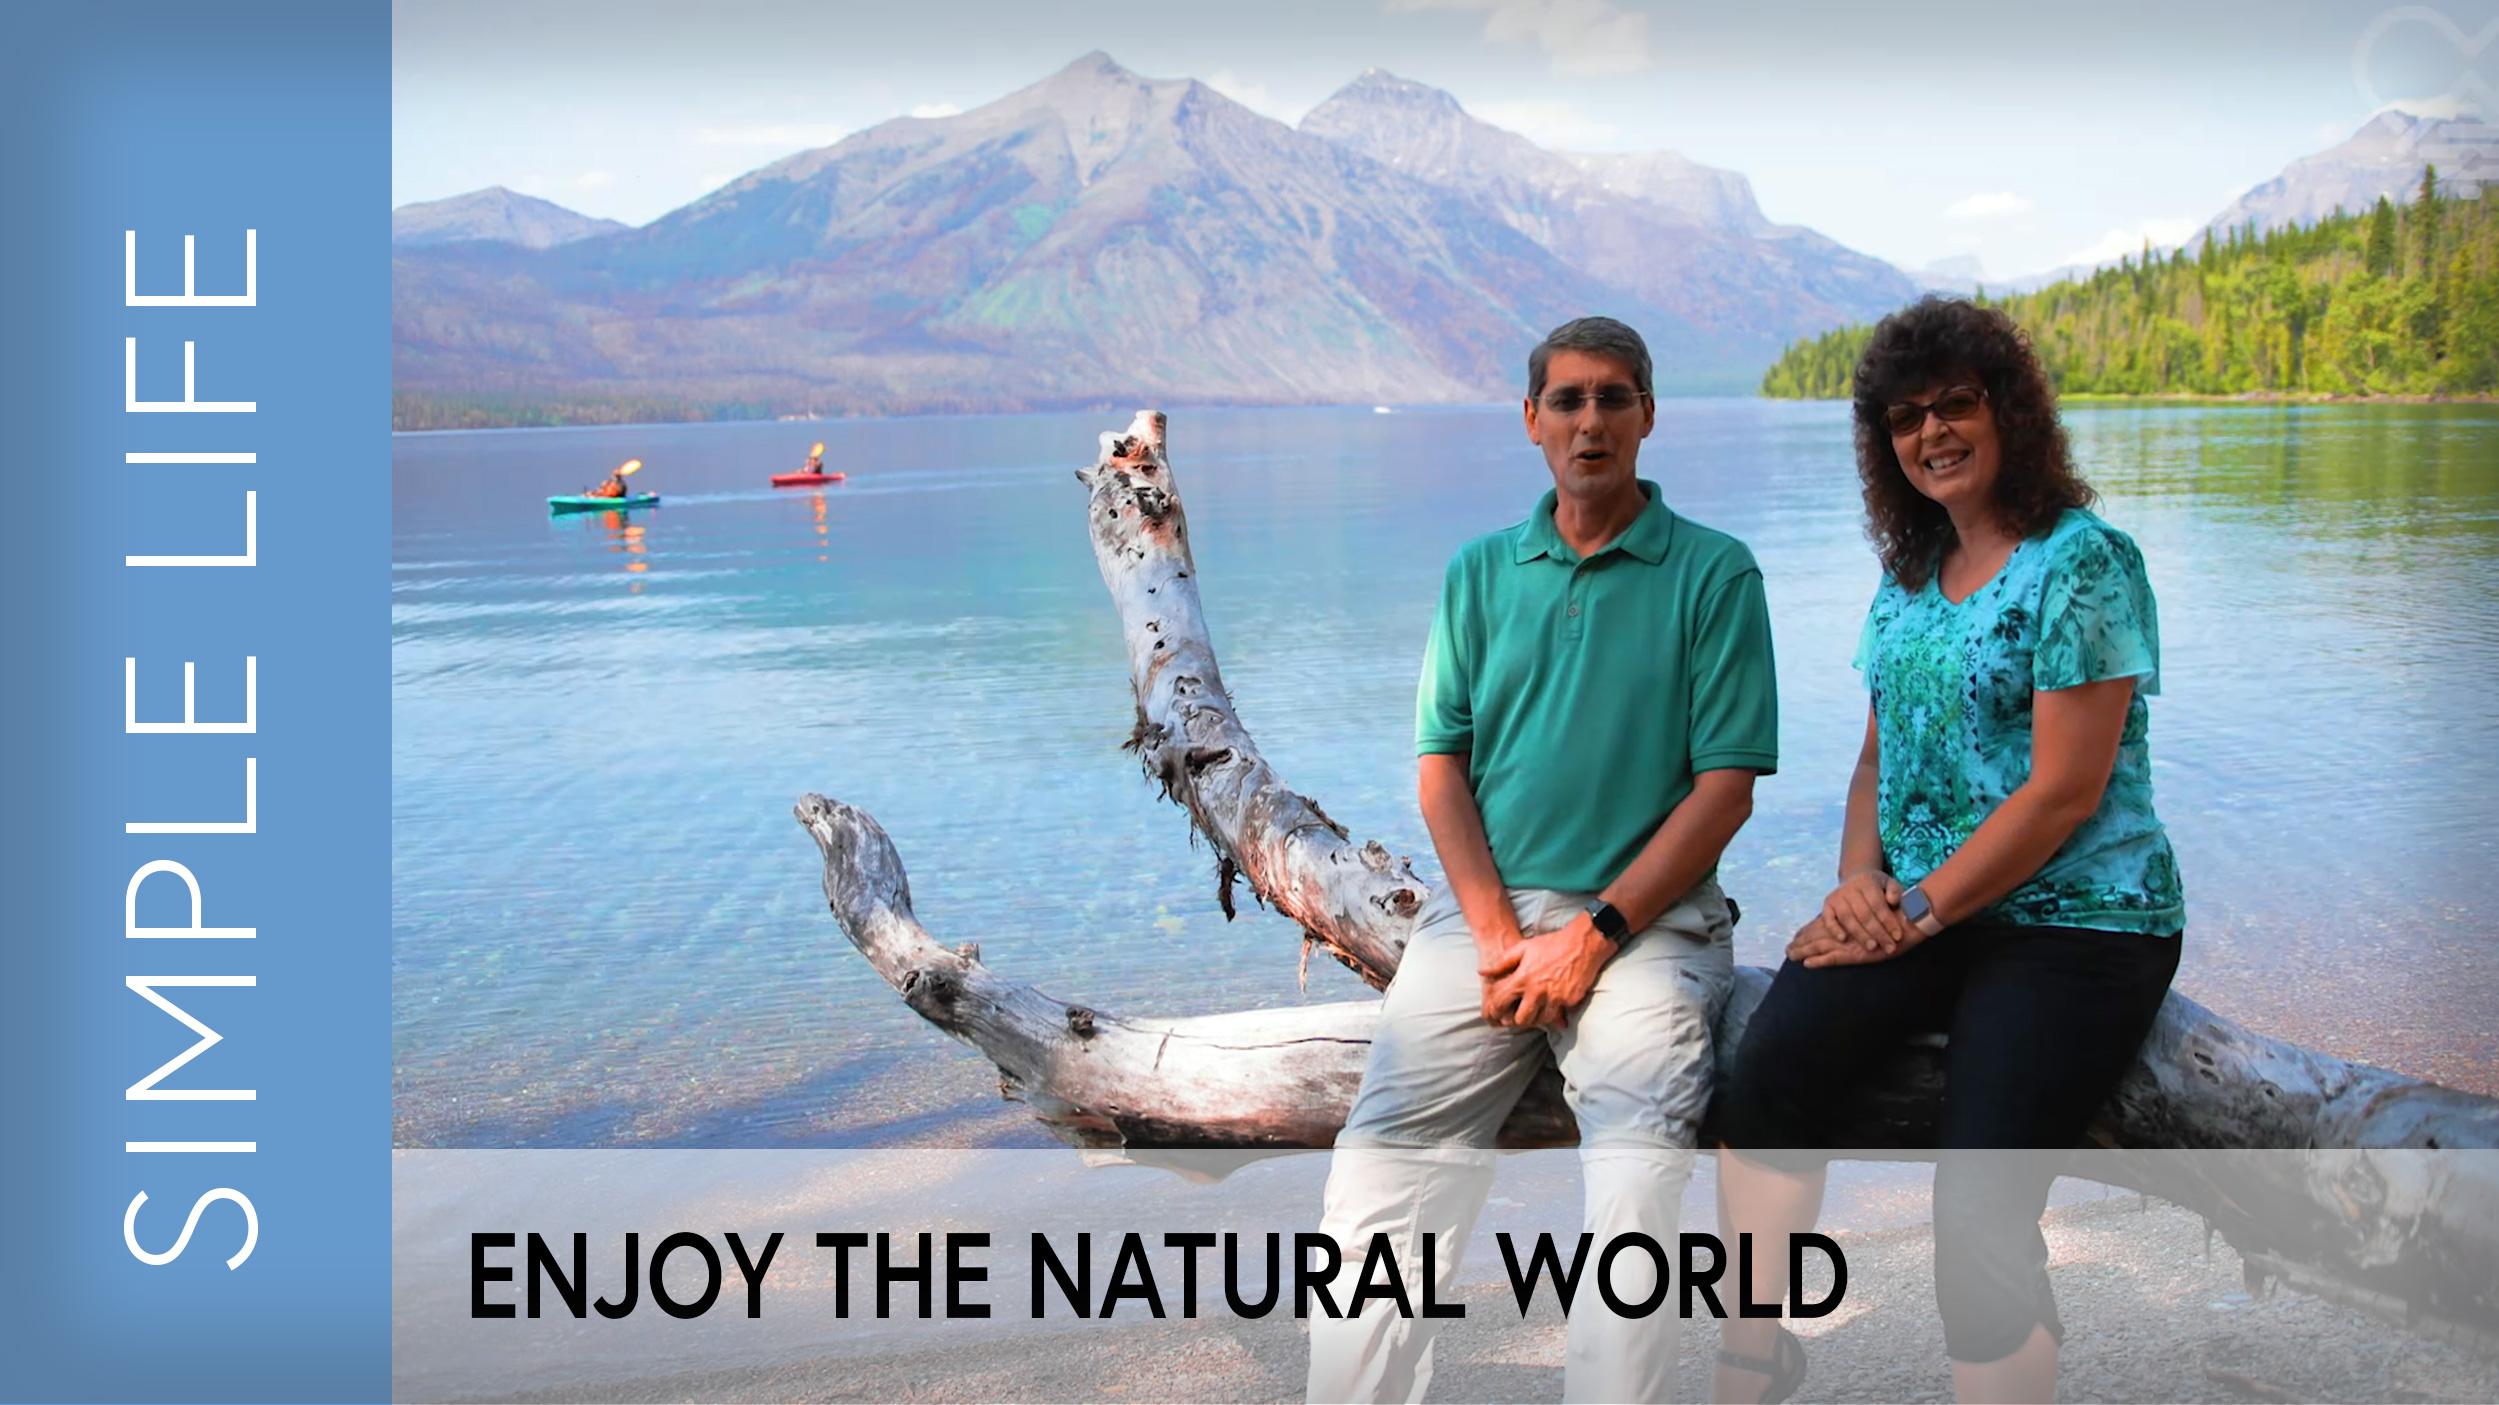 enjoy the natural world.jpg